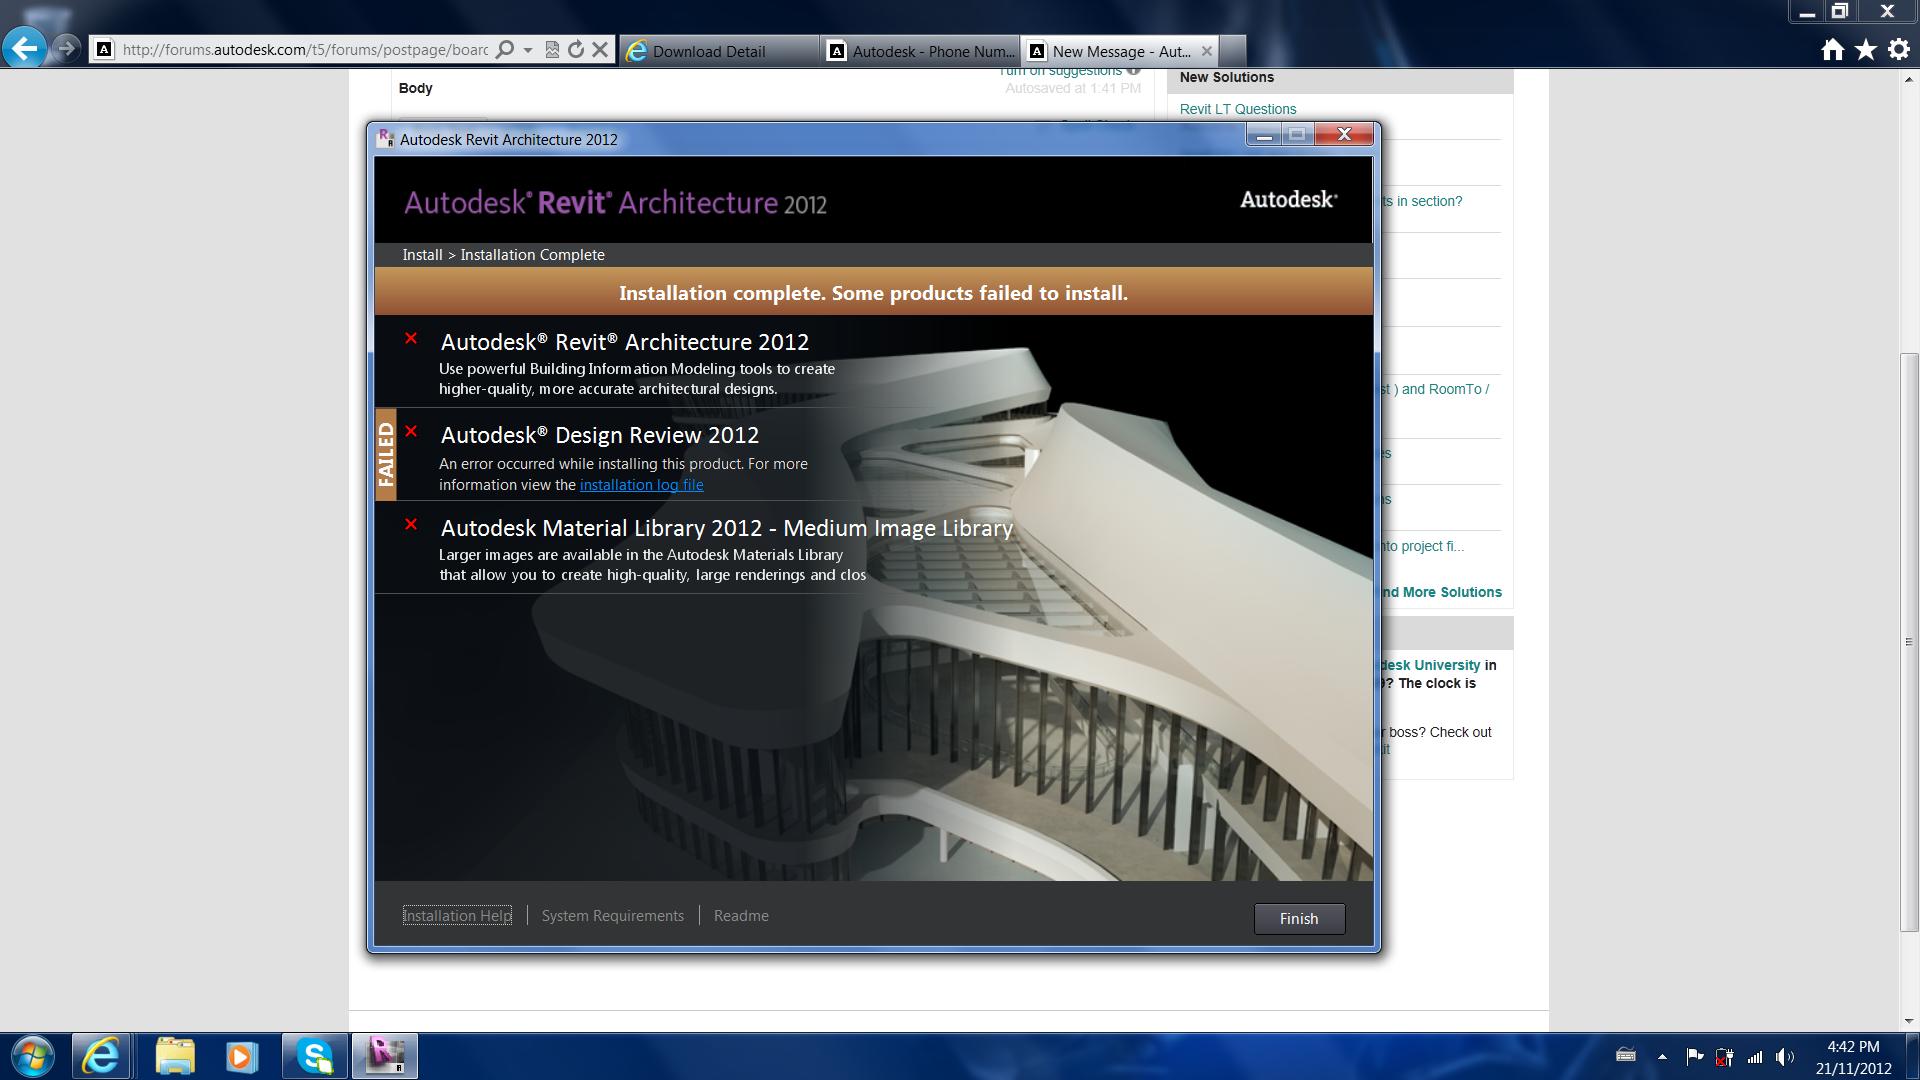 Autodesk quick uninstall imaginit building solutions blog.